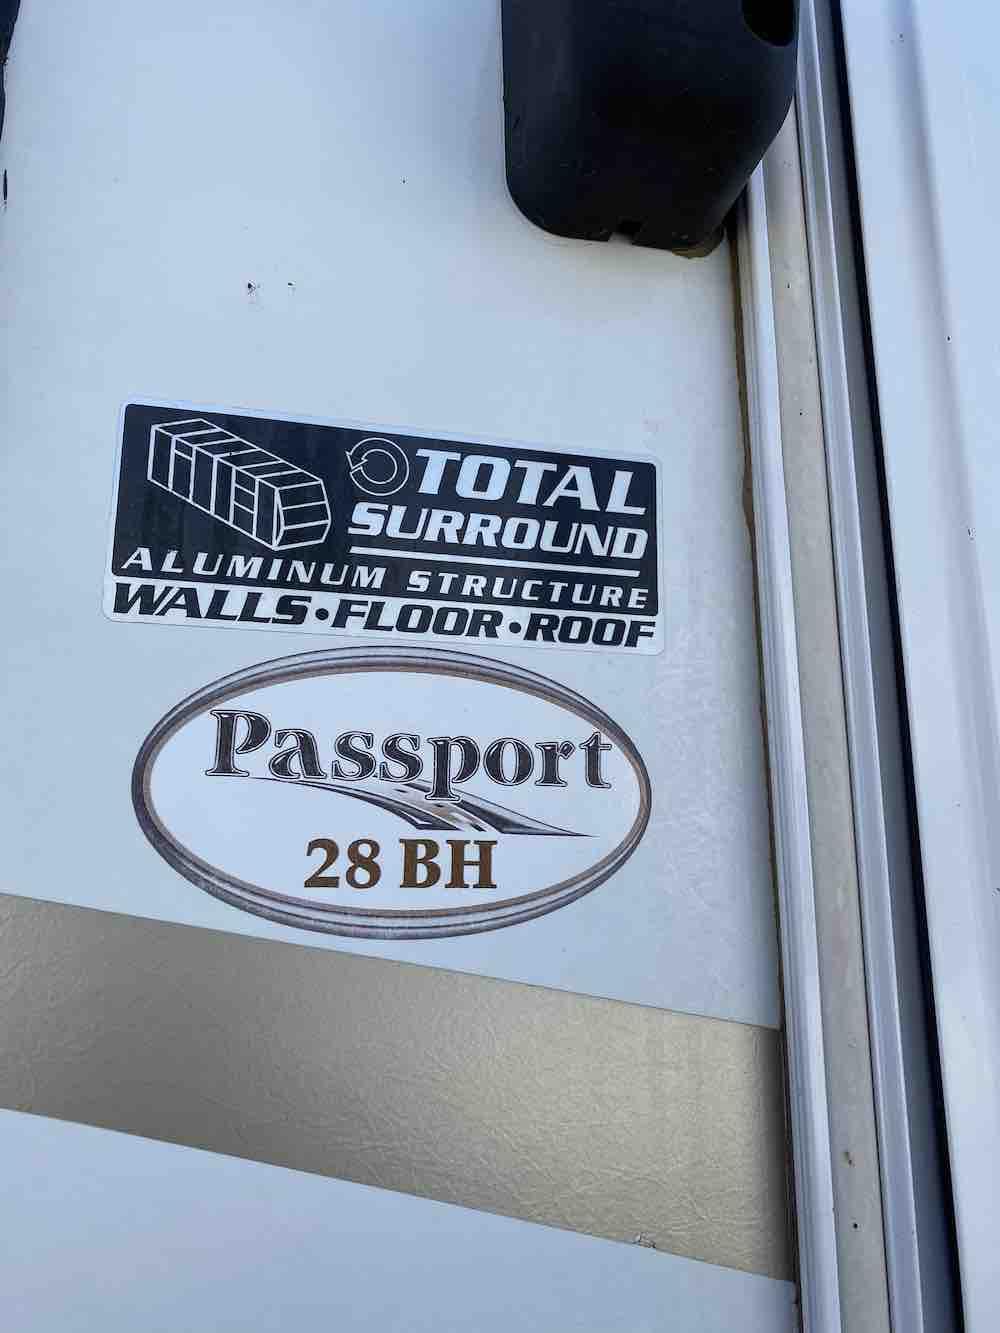 2014 KEYSTONE PASSPORT  ULTRA LITE ELITE 28BH full